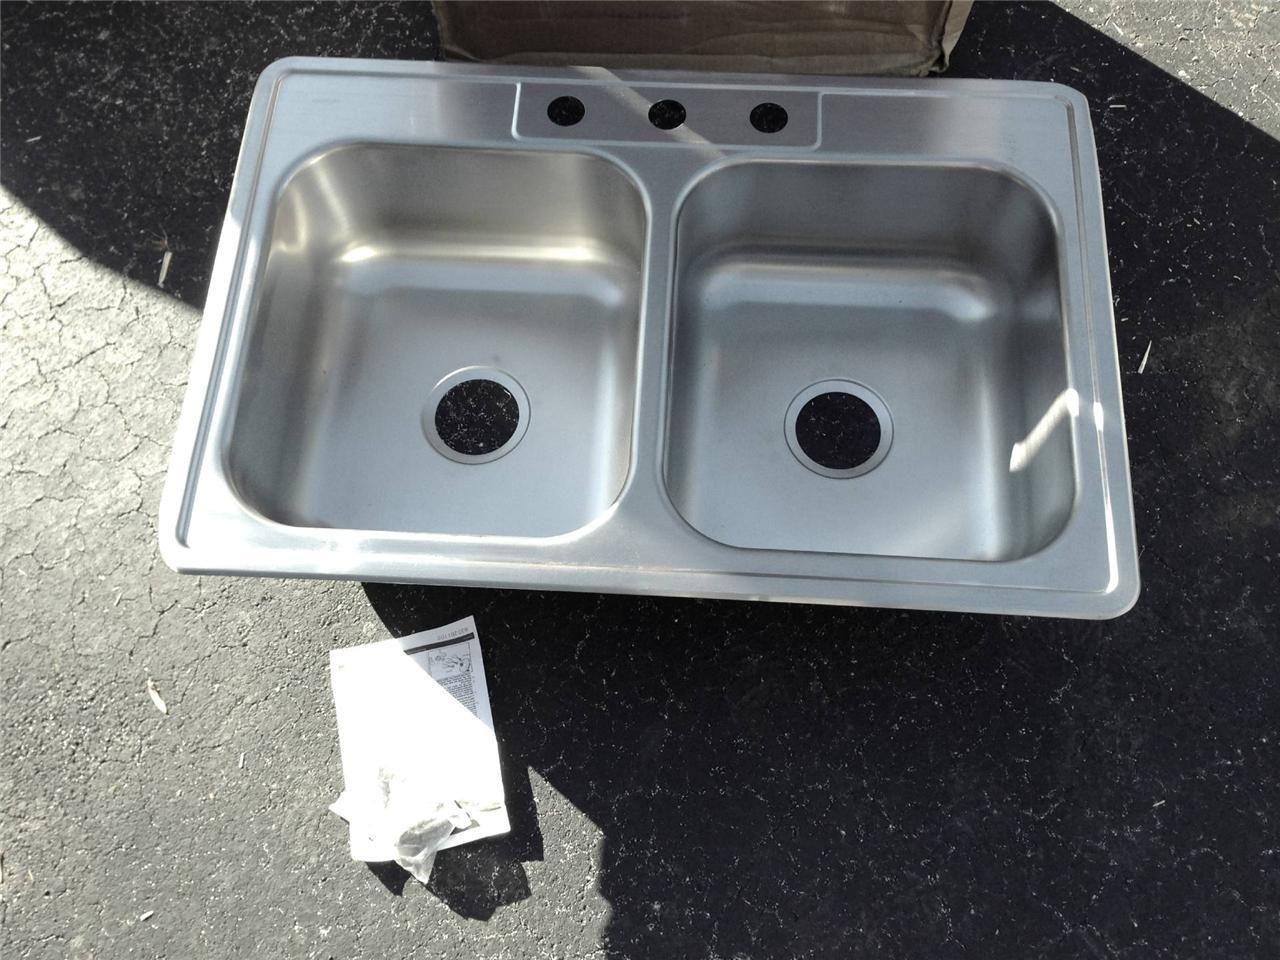 Dayton Sinks : Elkay DXR33223 Dayton 33x22x8 Stainless Steel Double Bowl Kitchen Sink ...